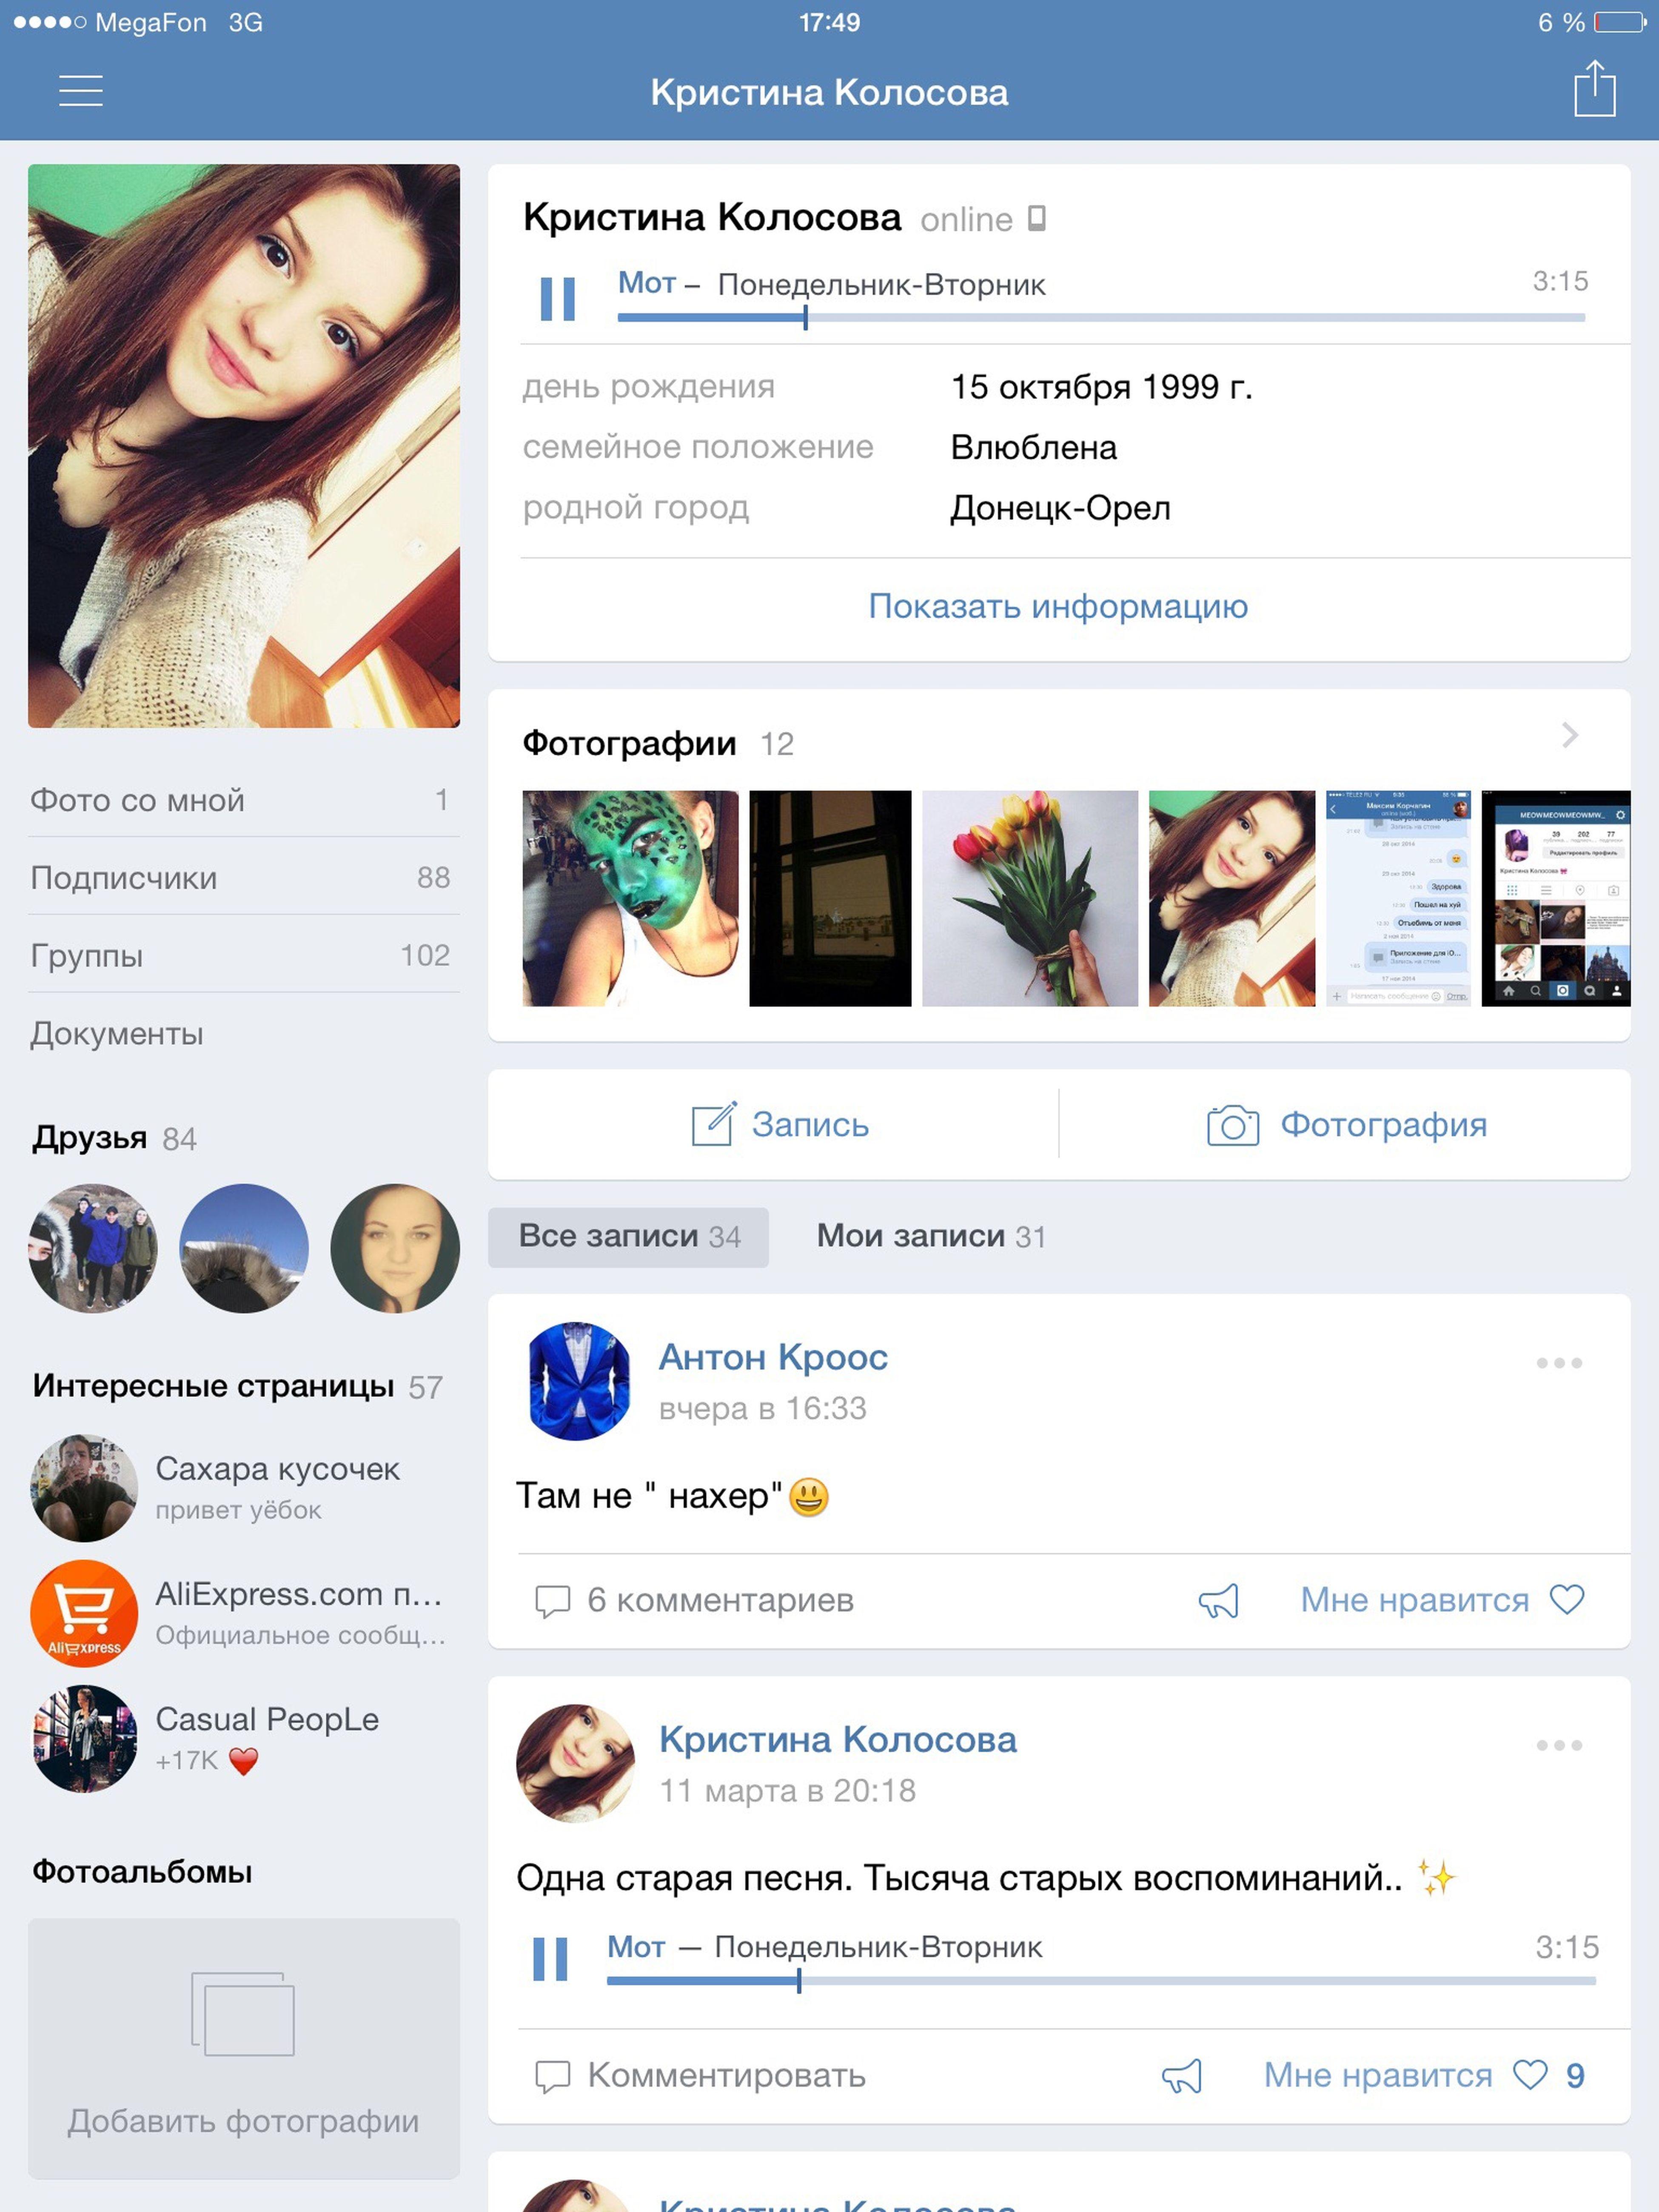 Го в вк https://vk.com/id230753439 вконтакте Вк Vk Vkontakte Gofriend Followme